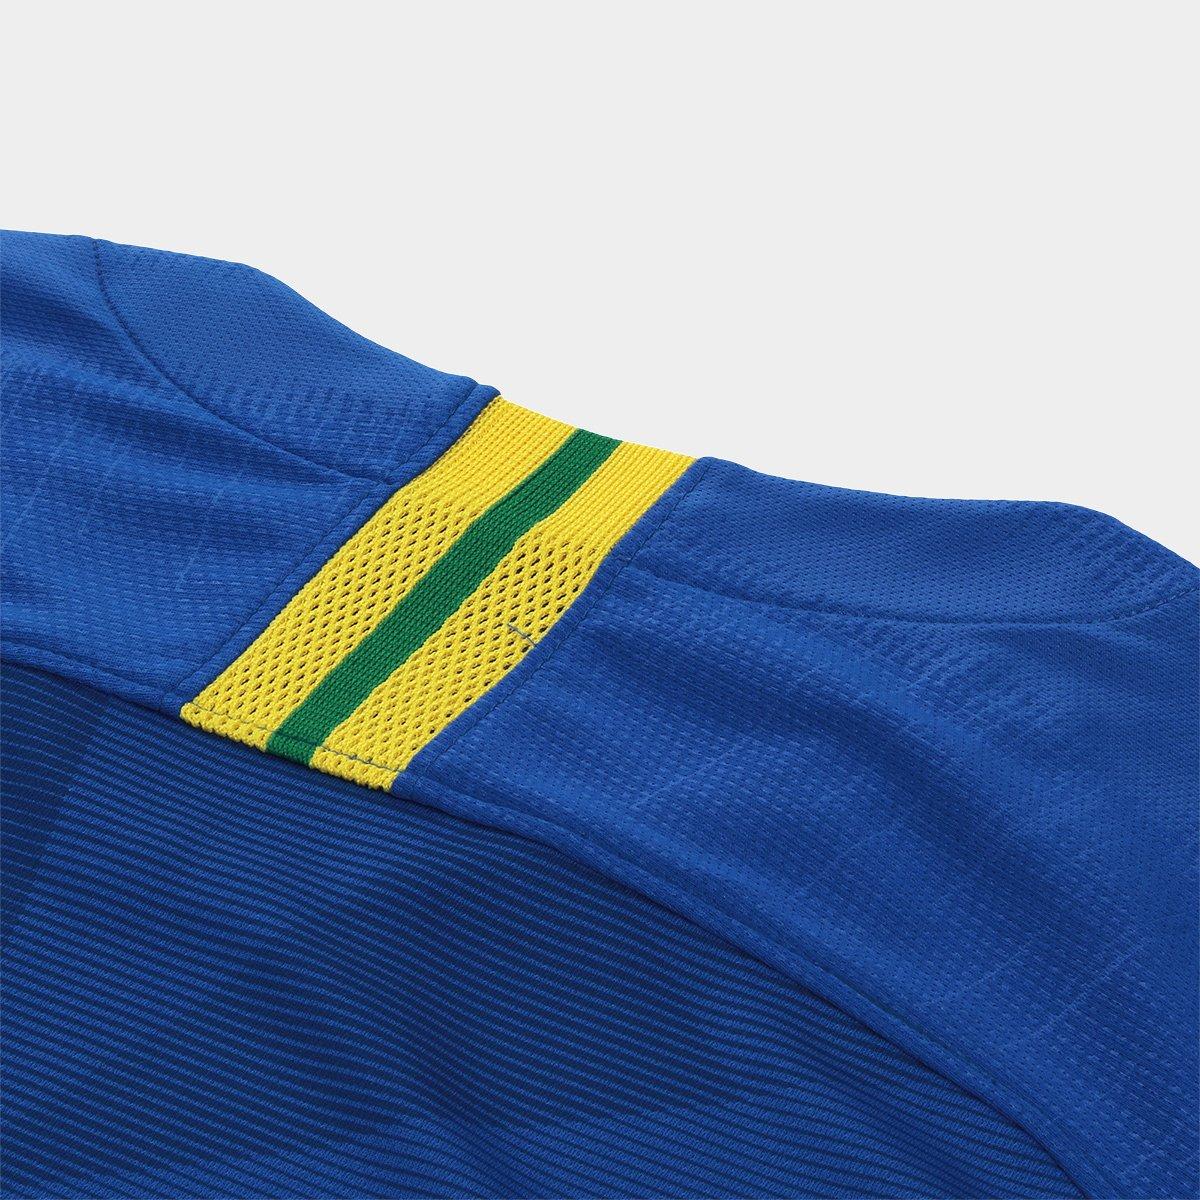 56dab14283 ... Camisa Seleção Brasil II 2018 nº 11 P. Coutinho - Torcedor Nike  Masculina ...